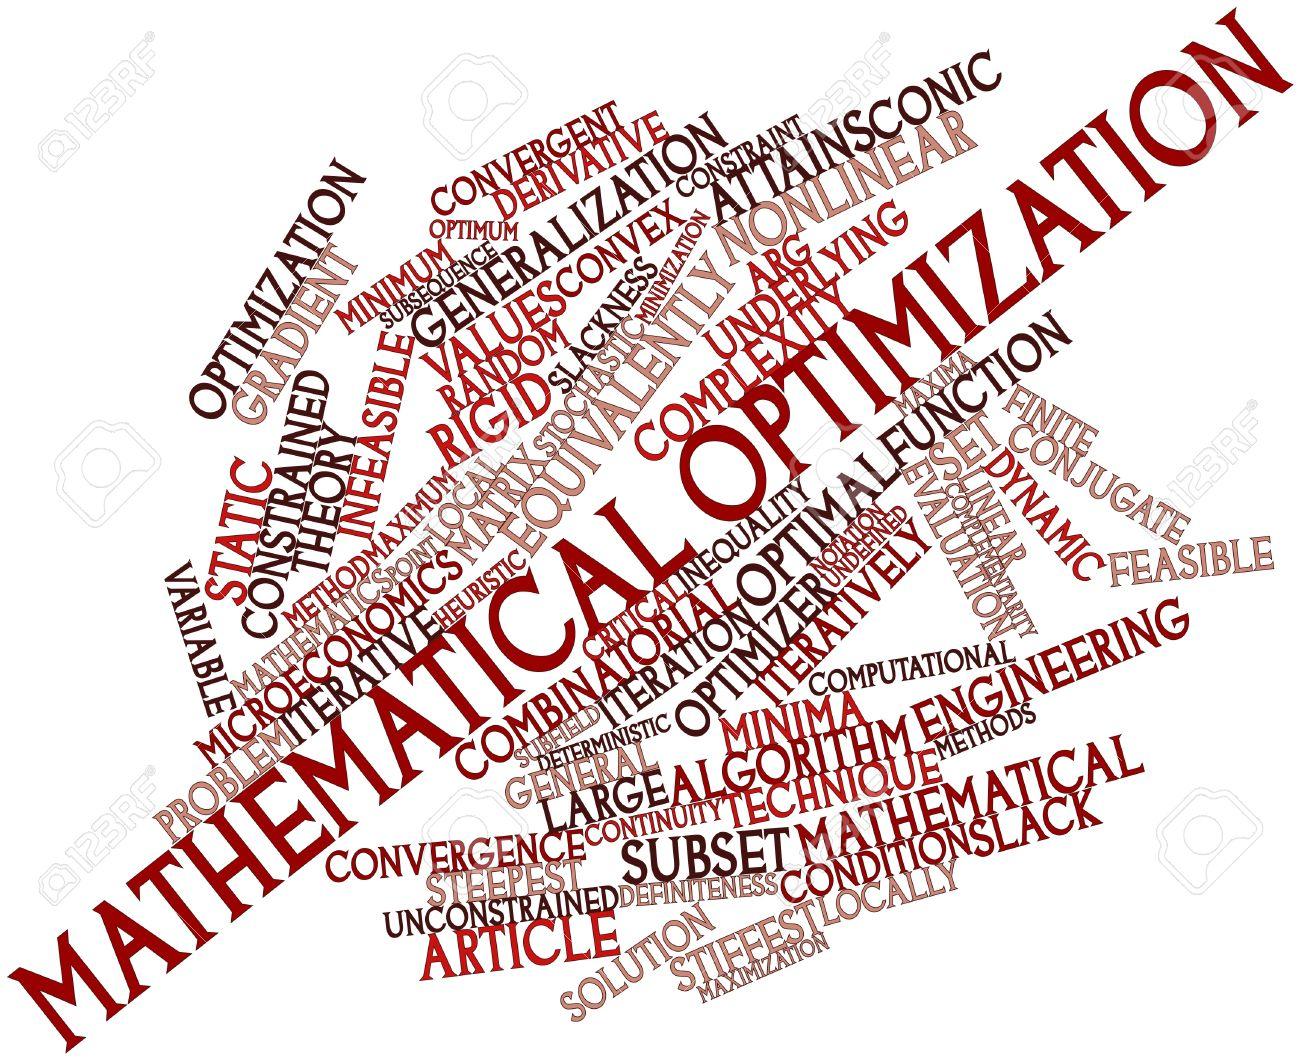 mathematical-optimization-word-cloud